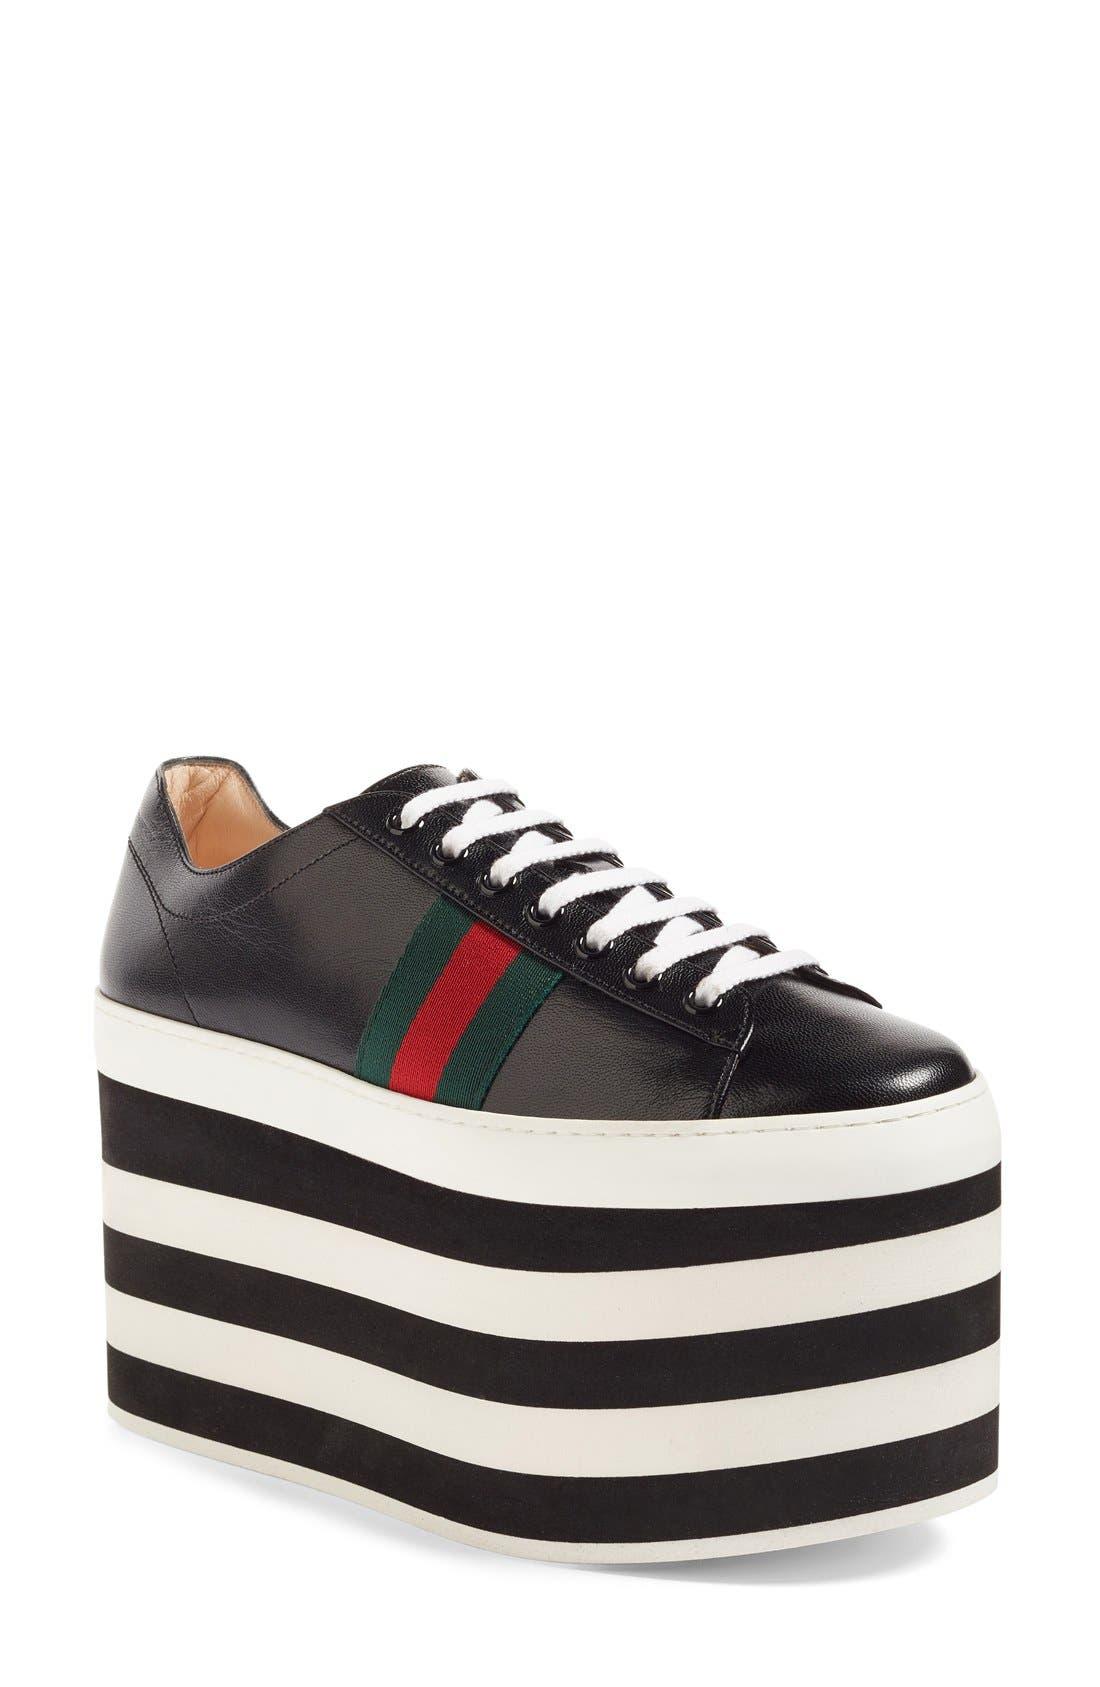 Gucci Peggy Platform Sneaker (Women)